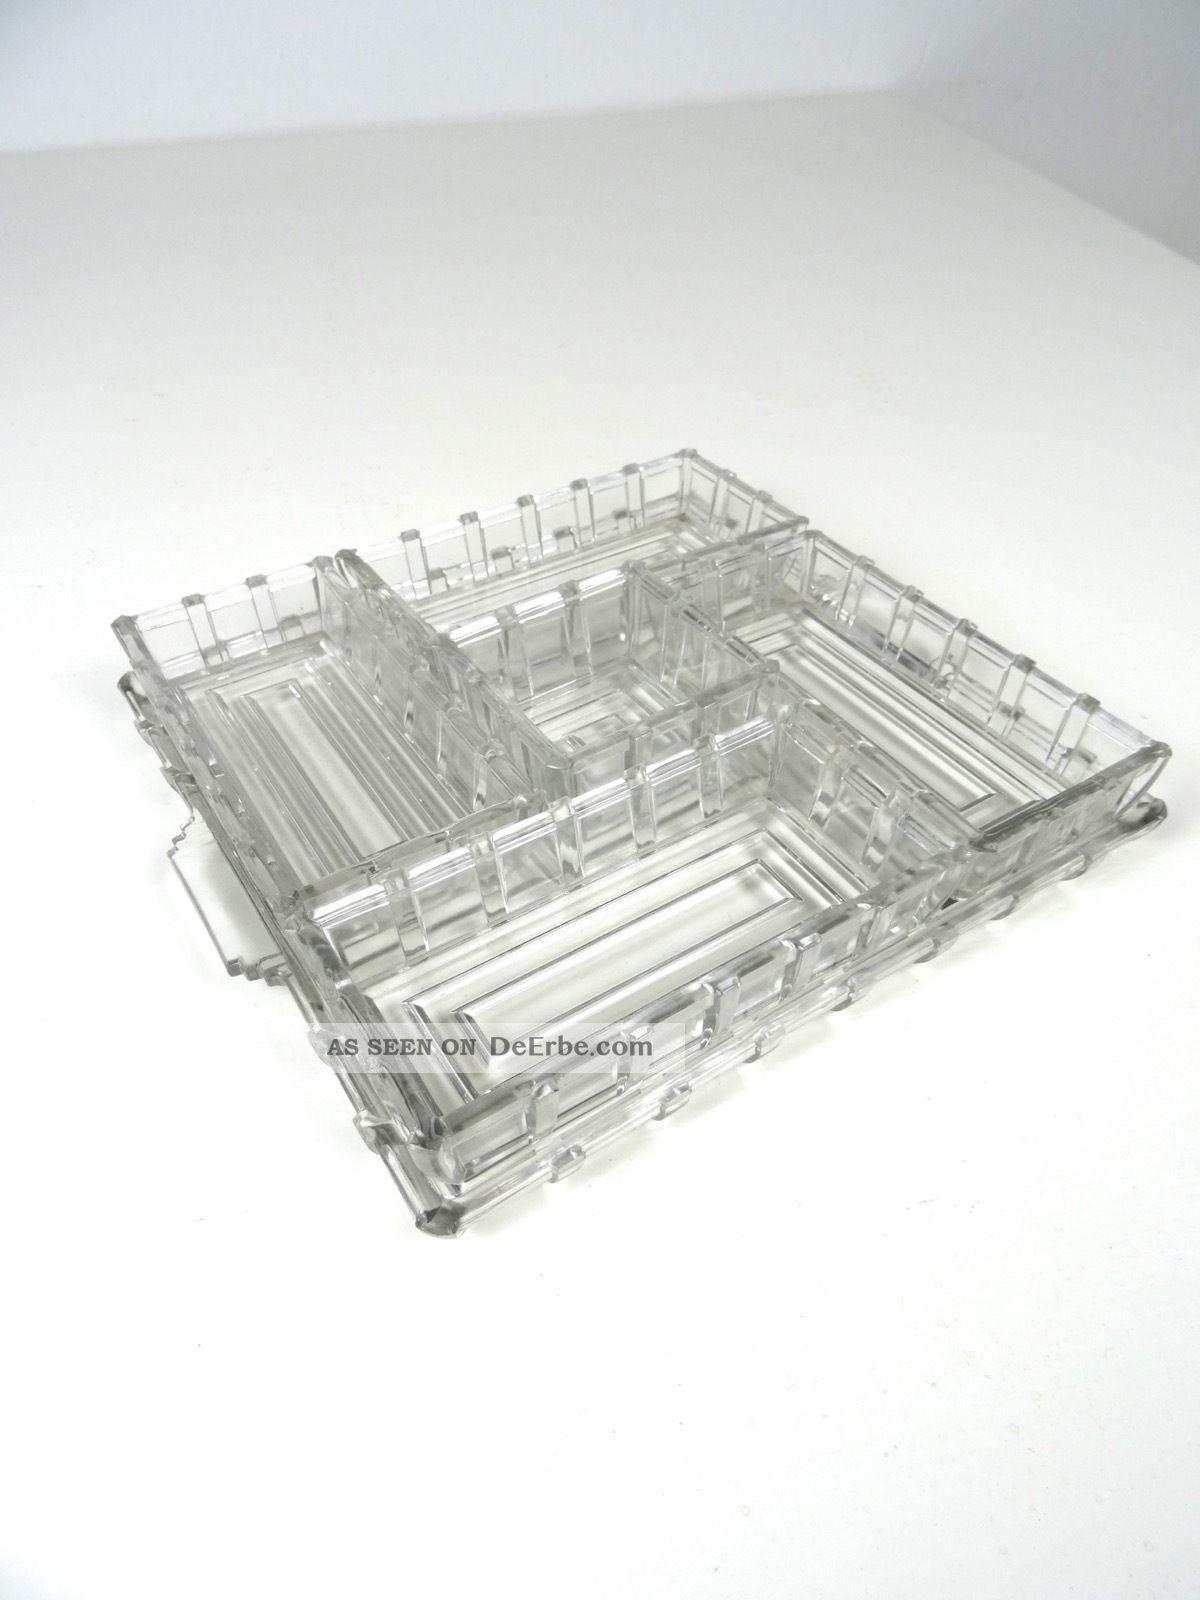 Art Deco Servier Tablett Frankreich 1930 Anbietschale Geometrisch Glas 1920-1949, Art Déco Bild